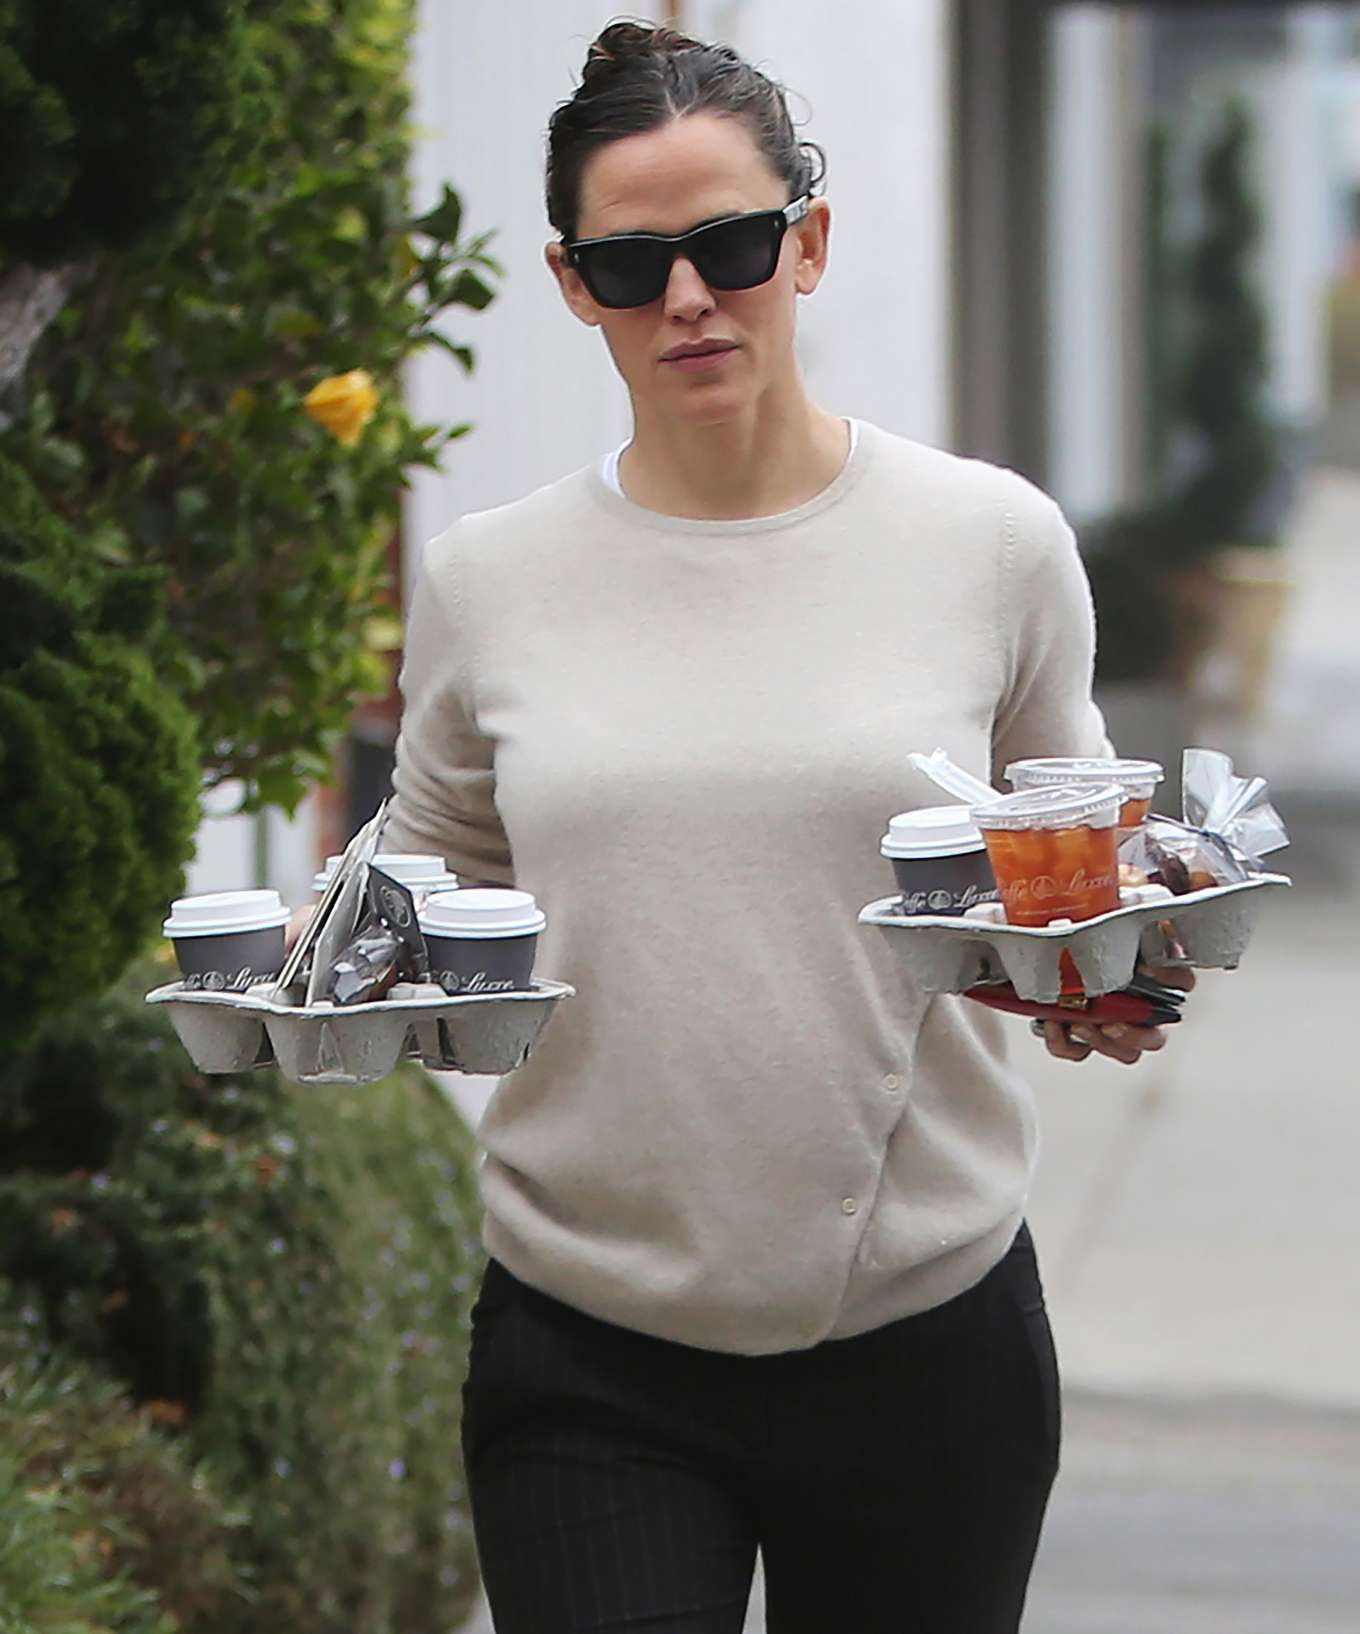 Jennifer Garner 2019 : Jennifer Garner – Goes for her coffee run in Santa Monica-14